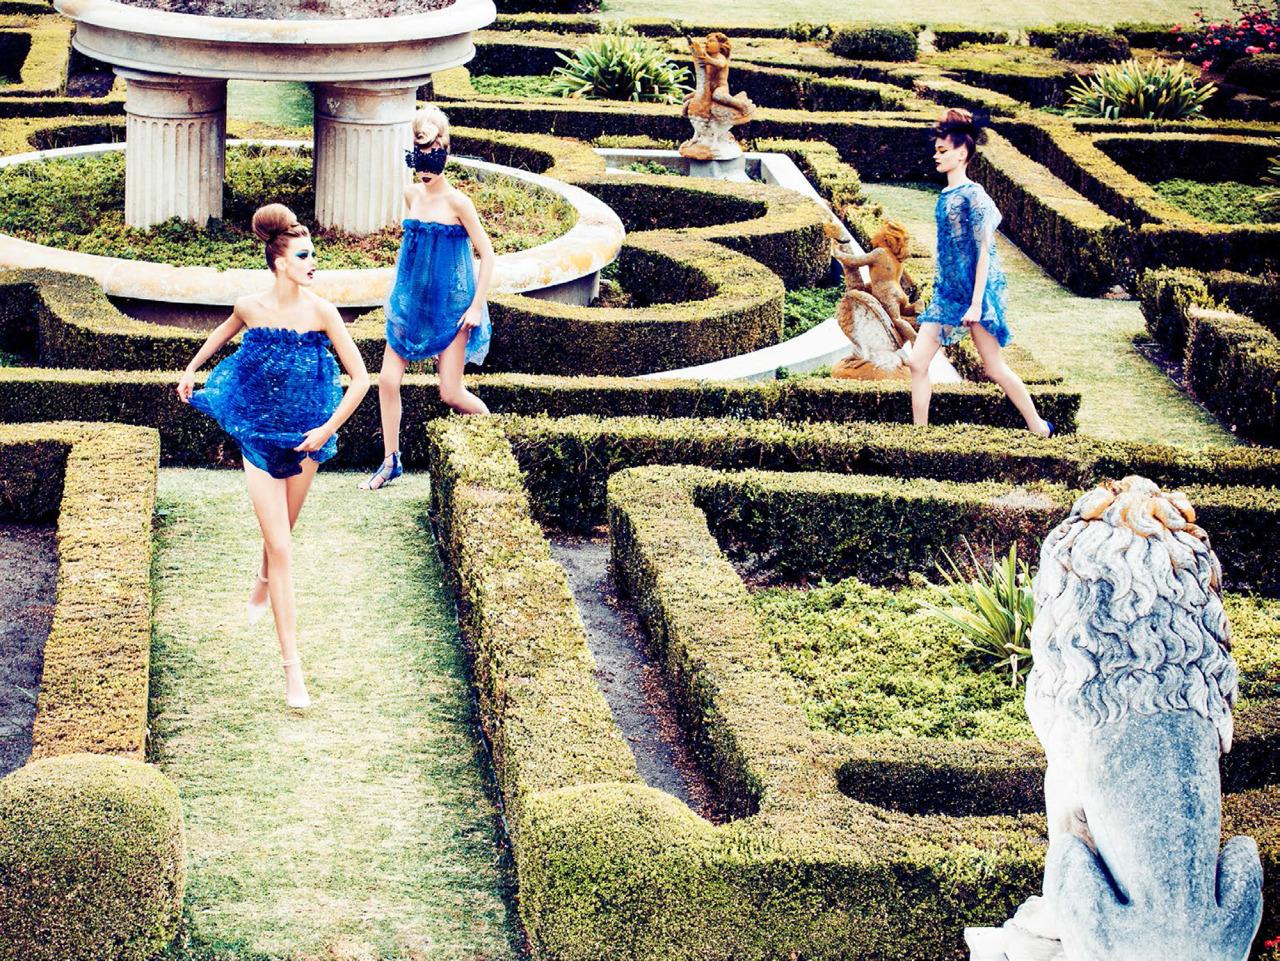 Frida Gustavsson, Tanya Katysheva & Wylie Hays / Photographed by Ellen von Unwerth / Styling by Elisabeth Sulcer, for Vogue Italia February 2014